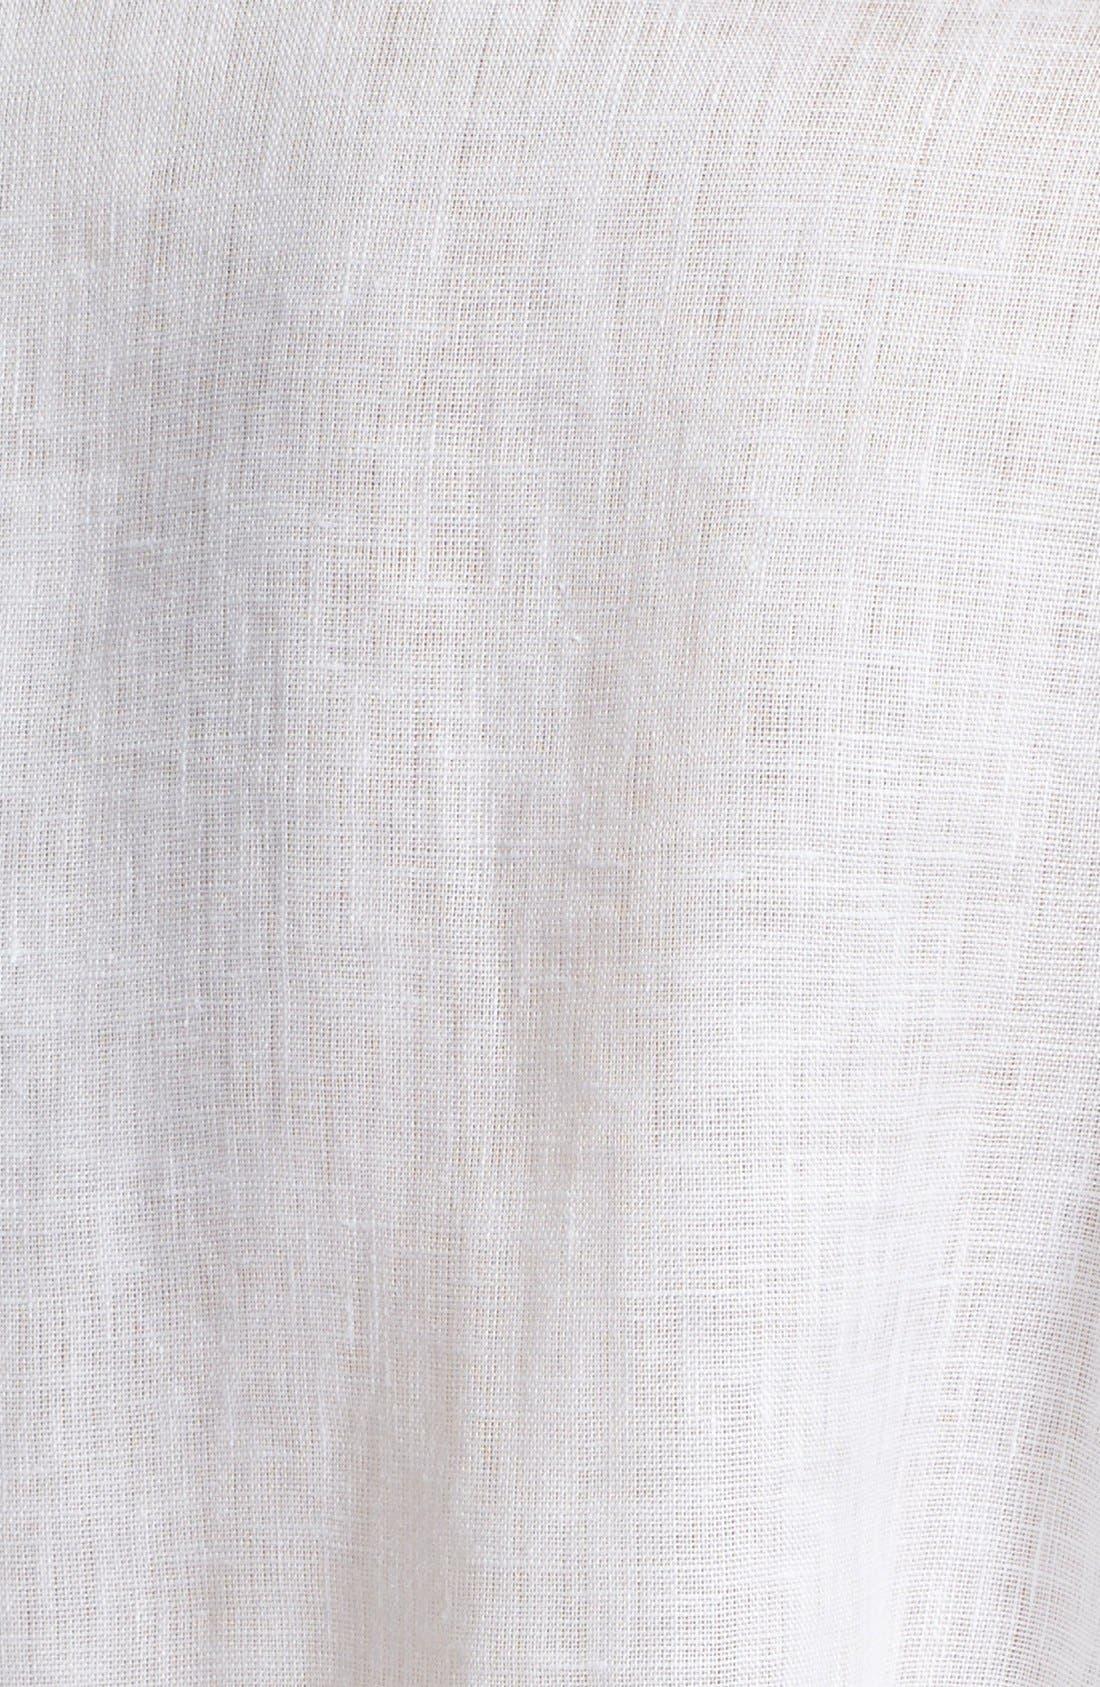 ARMANI COLLEZIONI,                             Linen Tuxedo Shirt,                             Alternate thumbnail 3, color,                             100